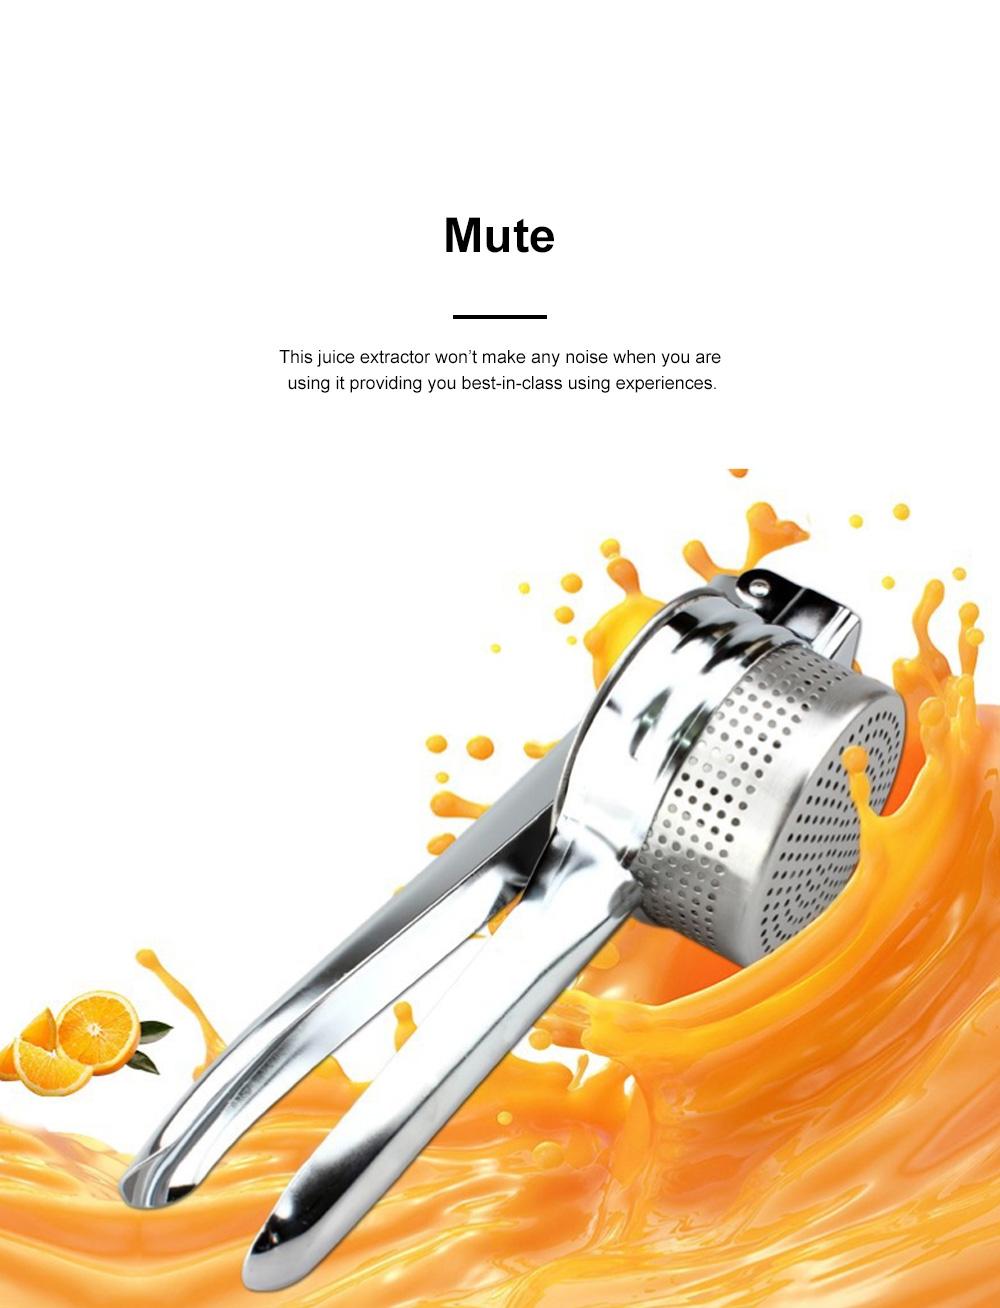 Handy Manual Operation Stainless Steel Juice Extractor Orange Lemon Juicer Garlic Press Kitchen Assistant Tool 3